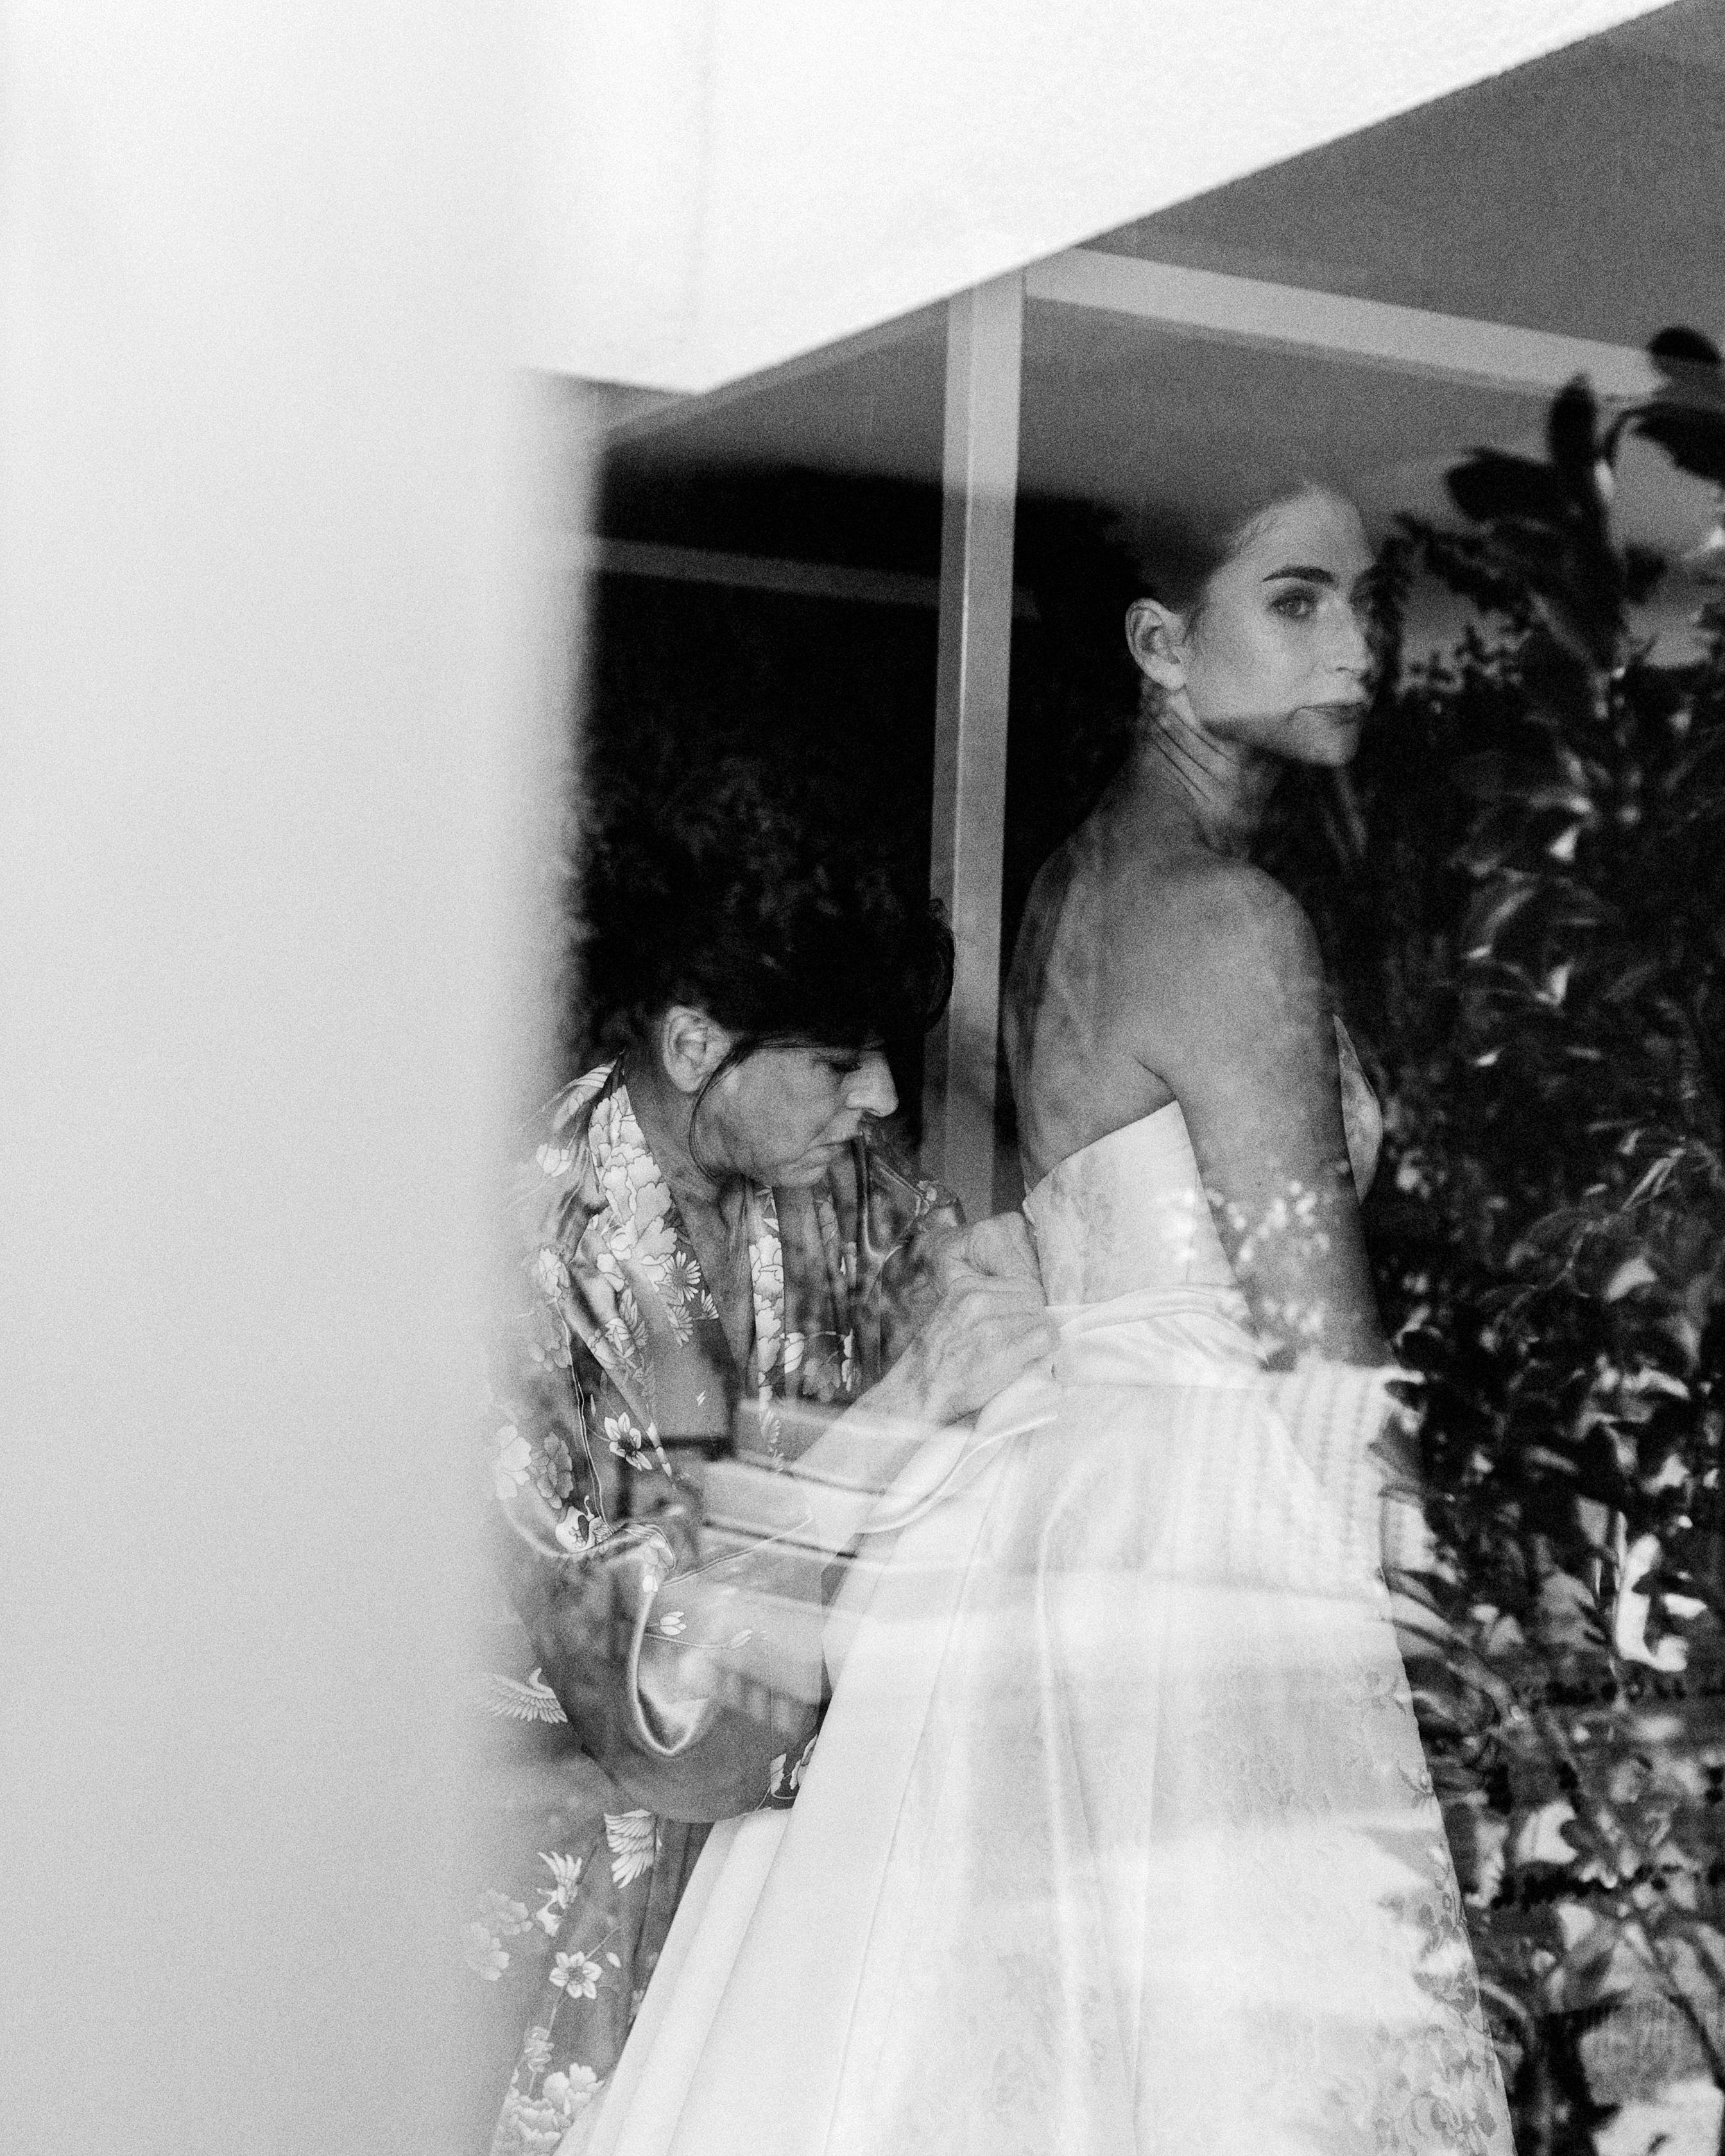 mia patrick wedding bride getting ready black and white